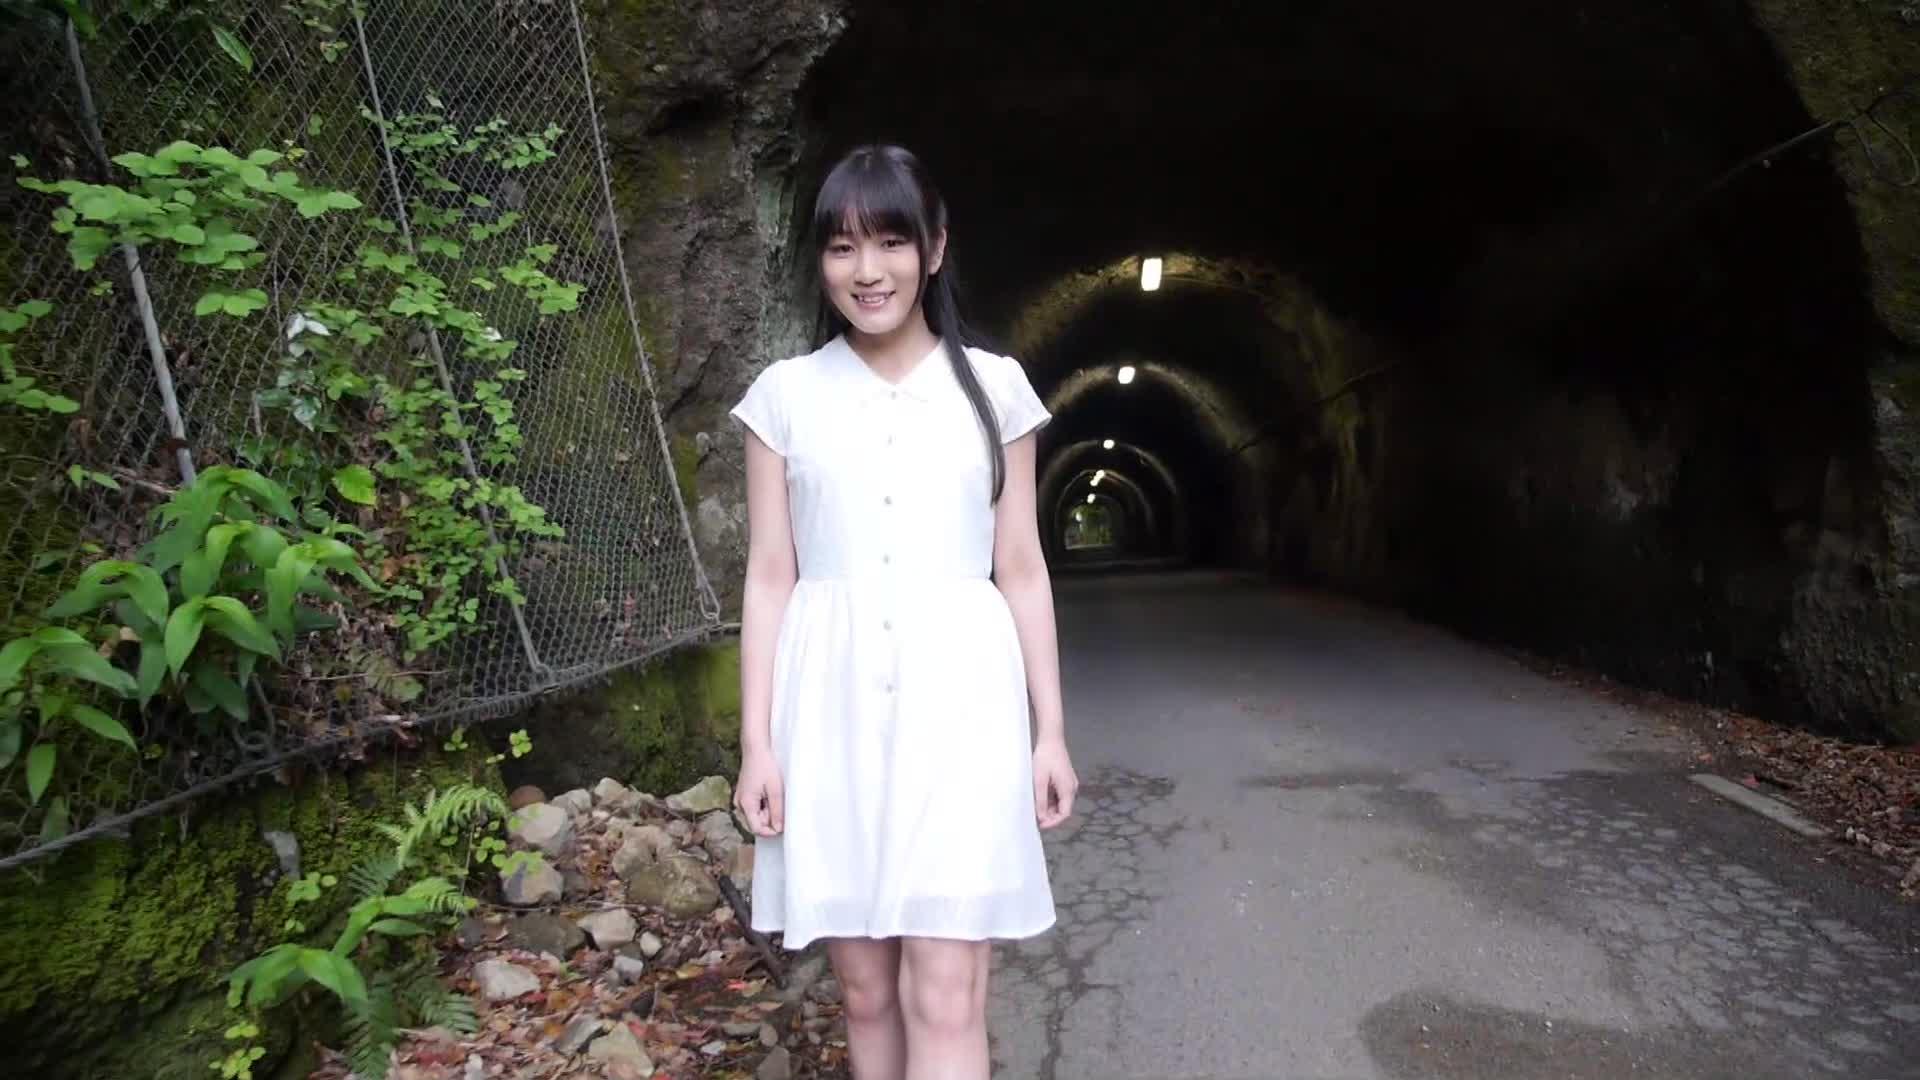 c15 - 卒業の約束/片瀬美月